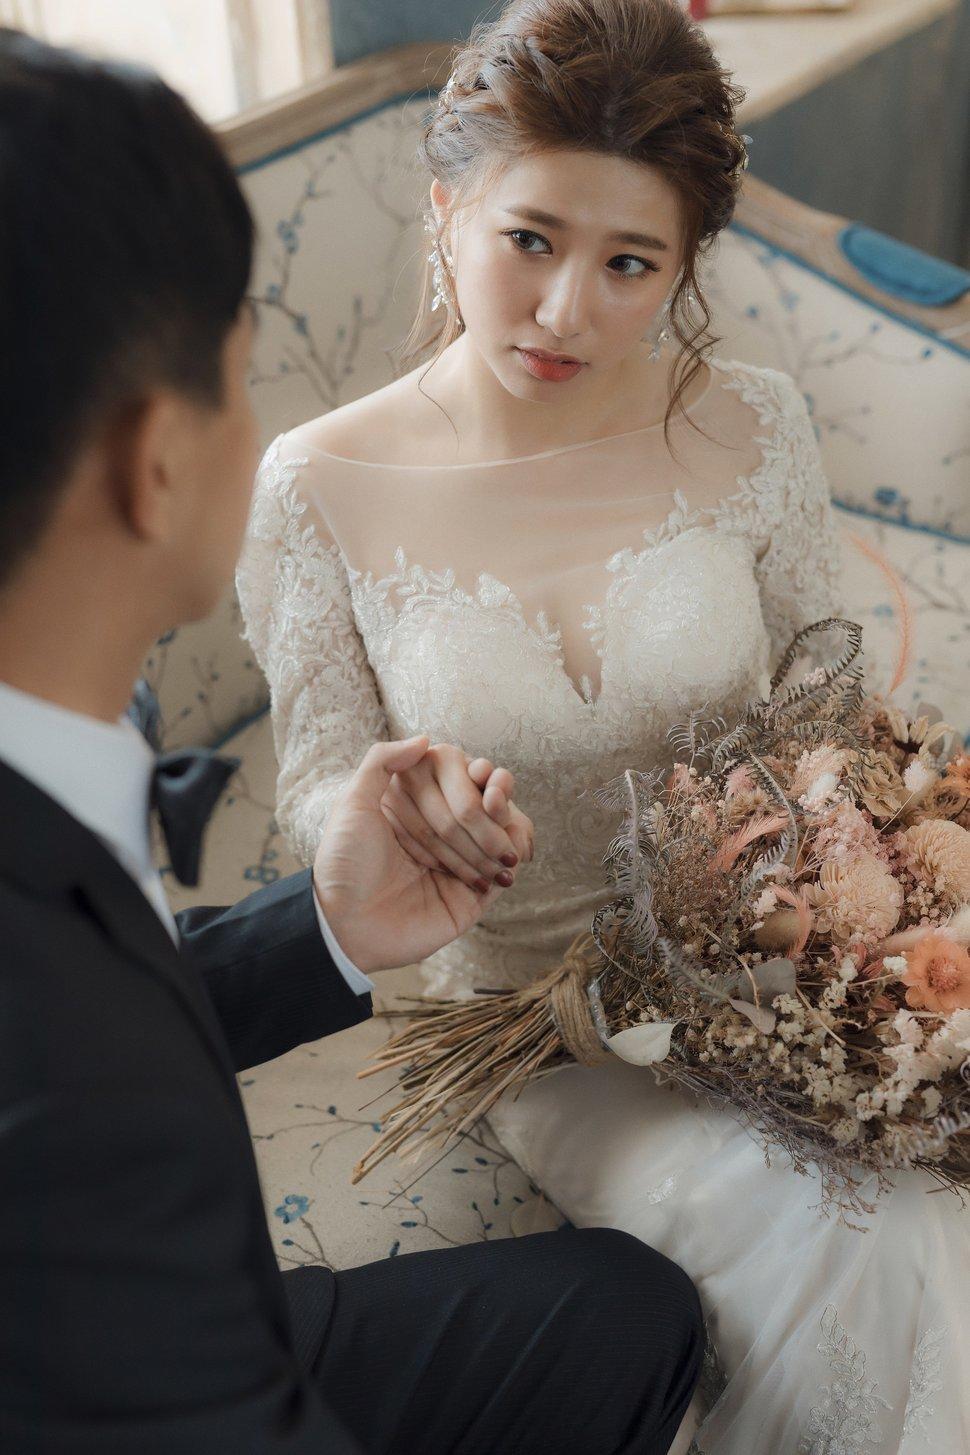 Khalil Chou(個性雜誌)-138 - Khalil Chou (凱勒·周)《結婚吧》